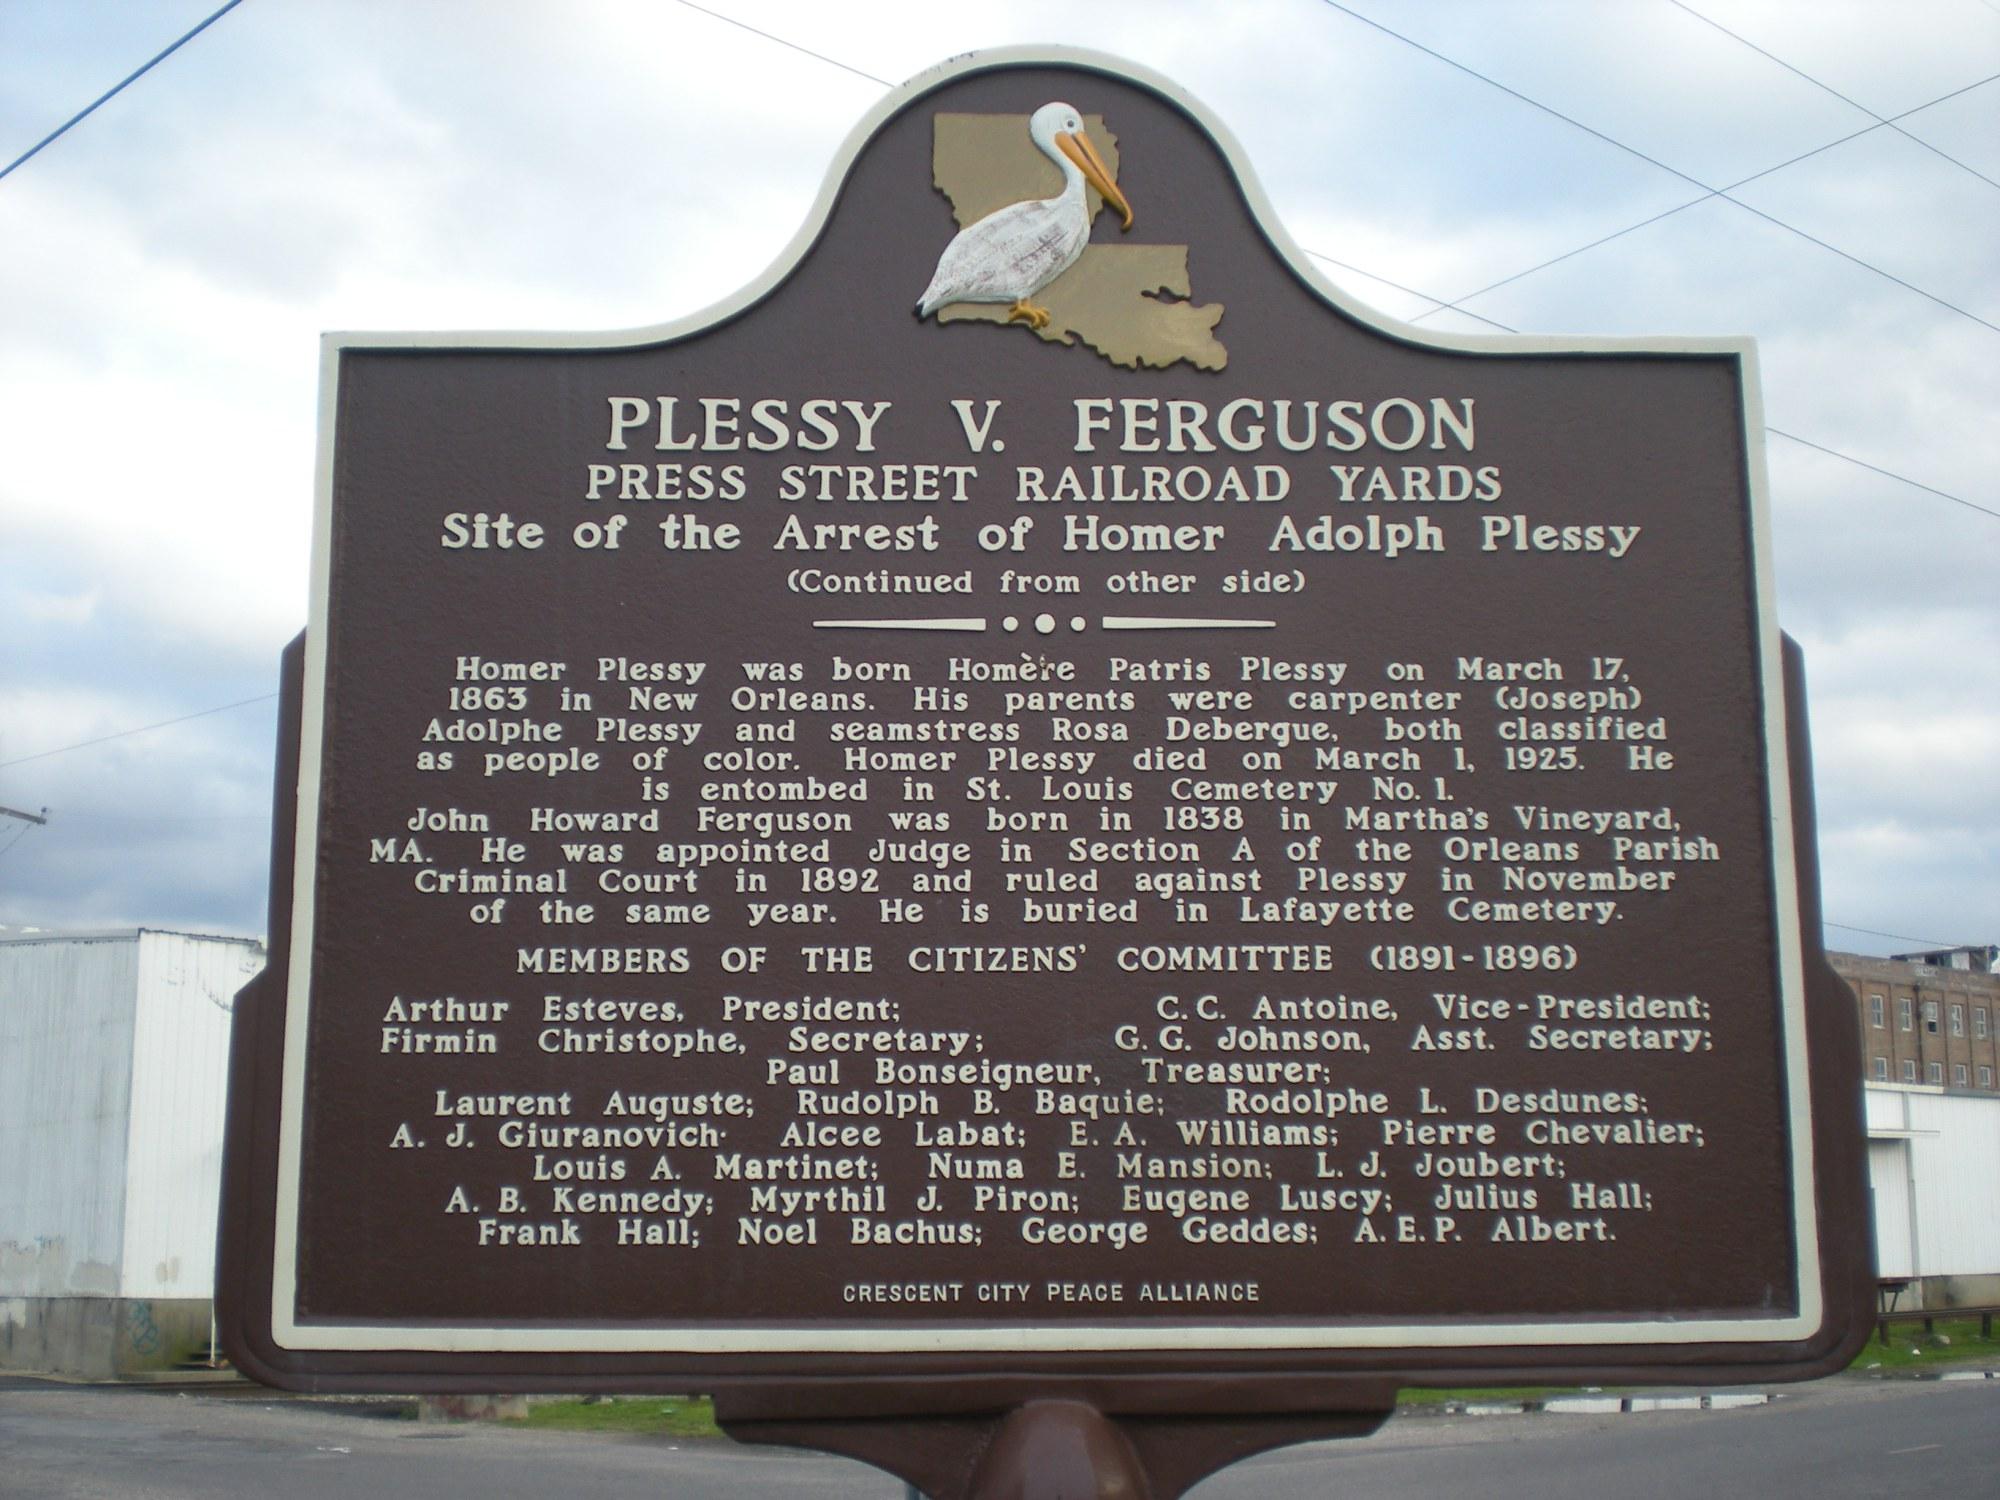 Plessy v. Ferguson: The Supreme Court's Most Notorious Decision